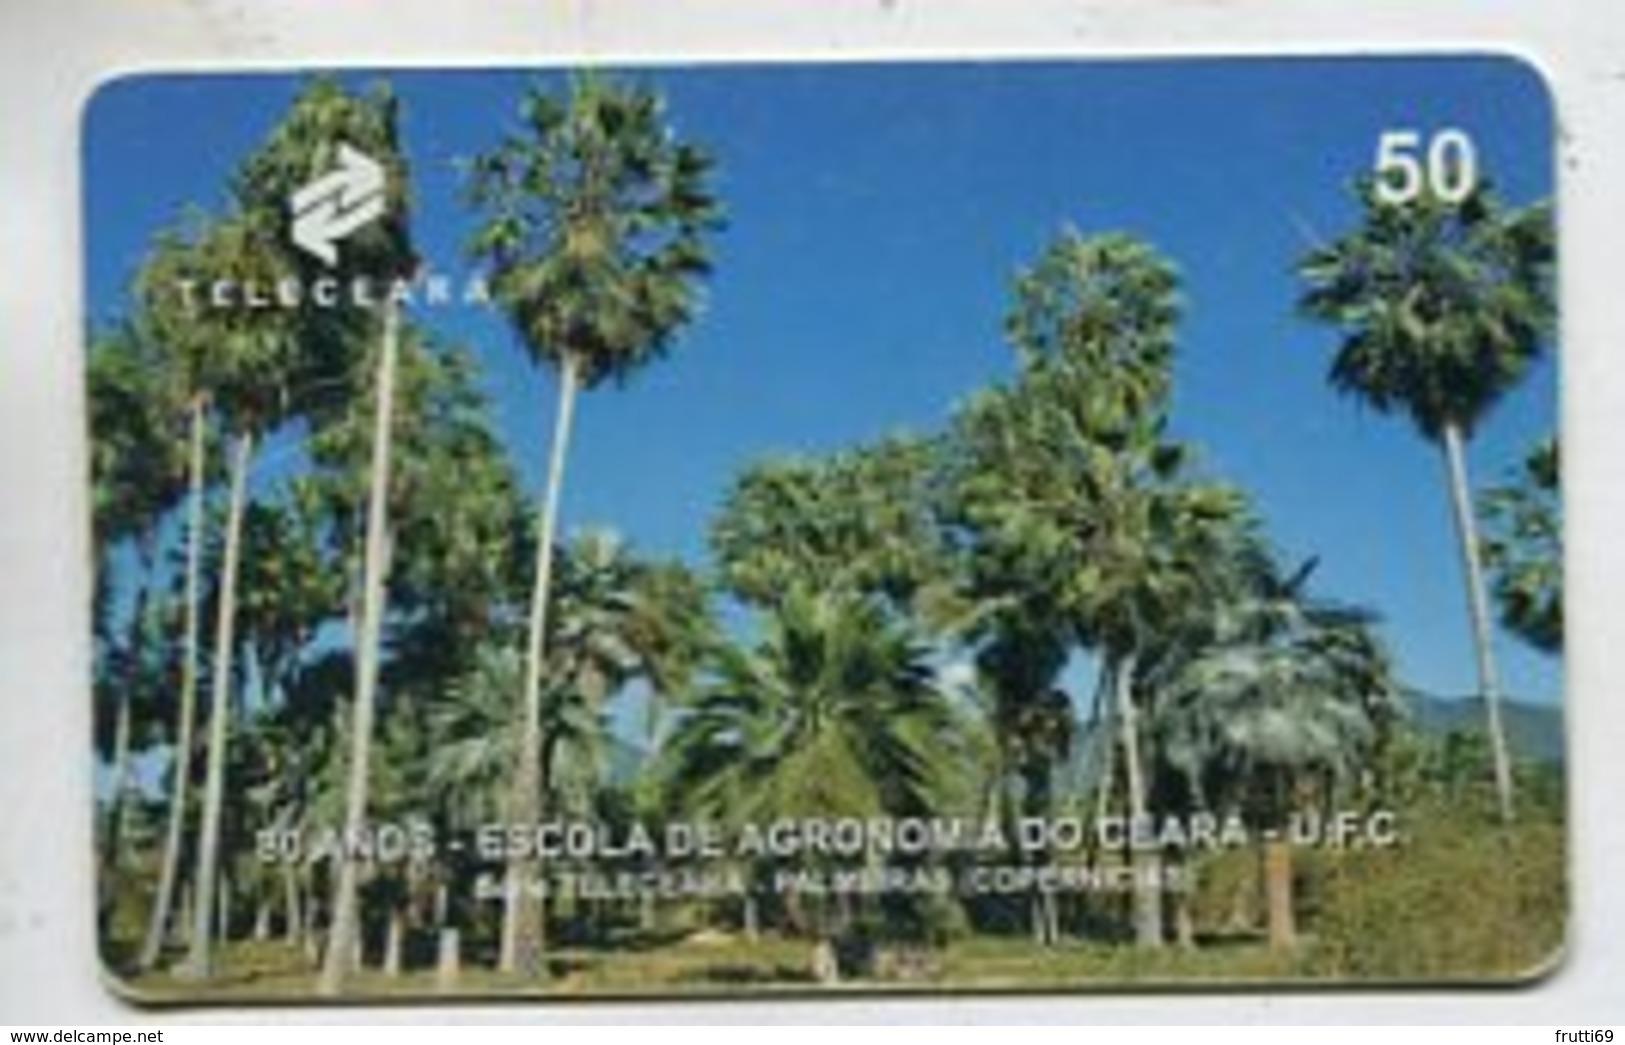 TK 07514 BRAZIL - Teleceara - Brasilien